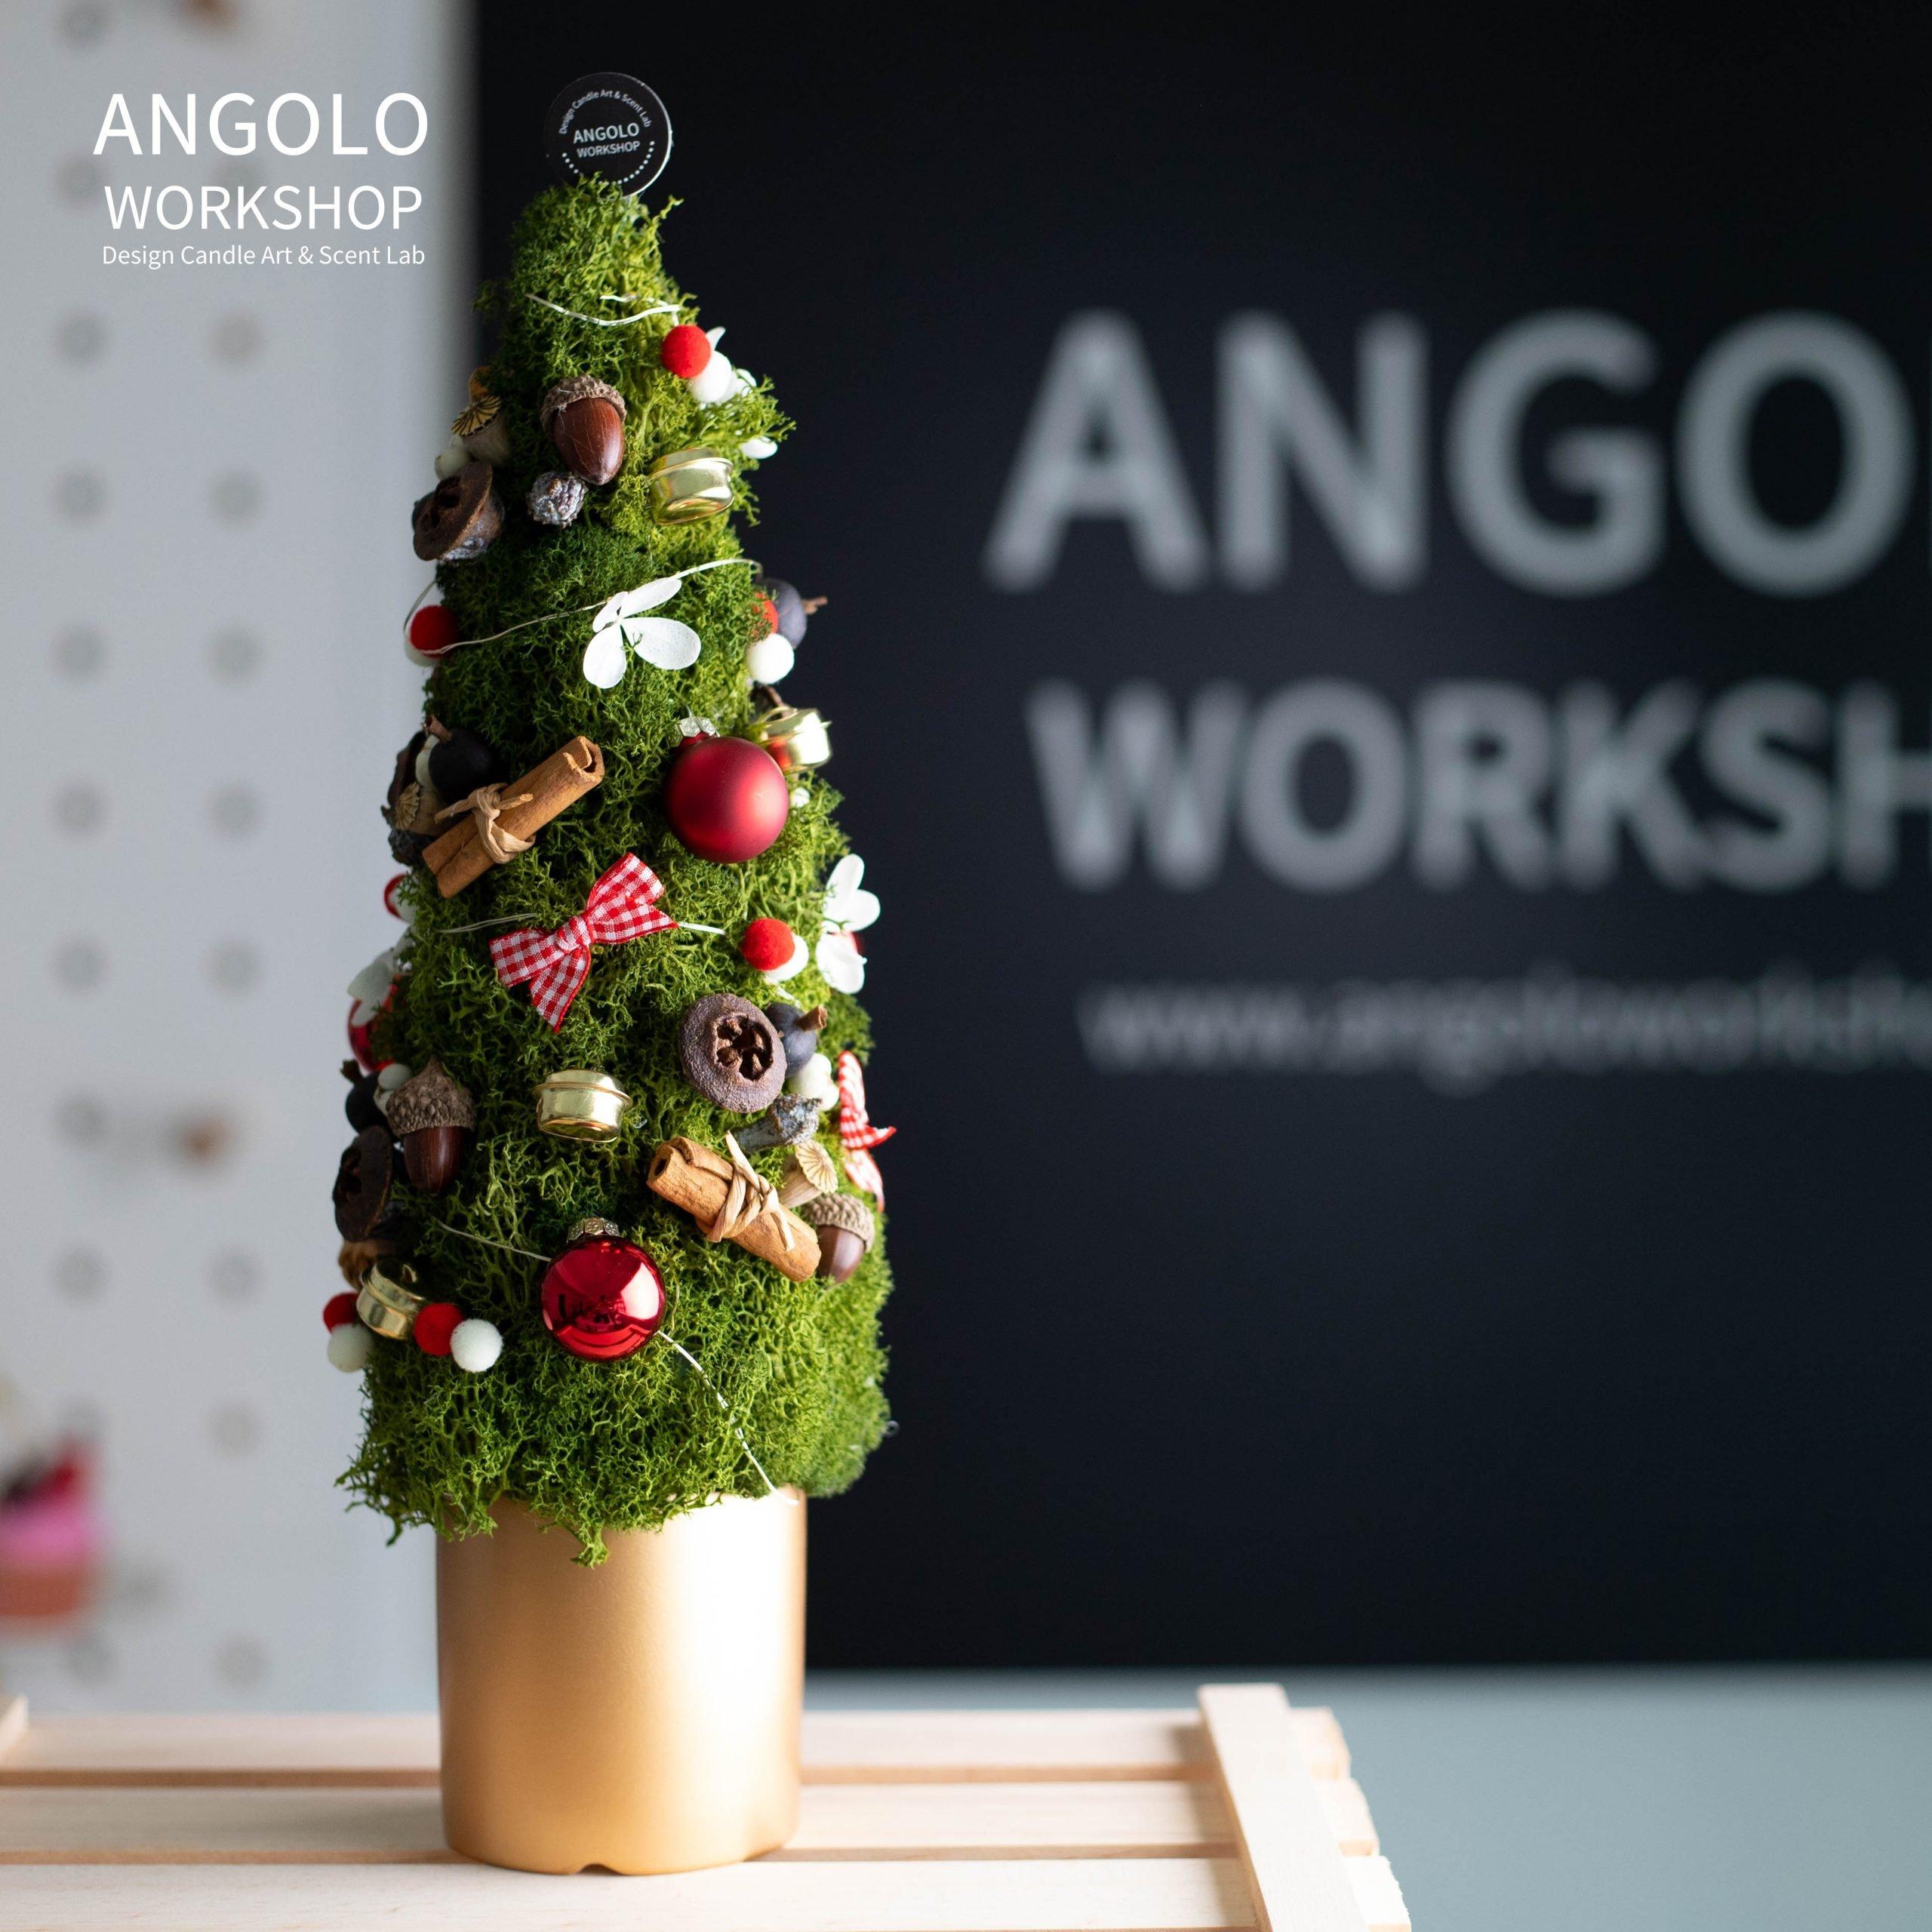 保鮮花聖誕樹工作坊 Preserved Flowers Christmas Tree Workshop (已完結)